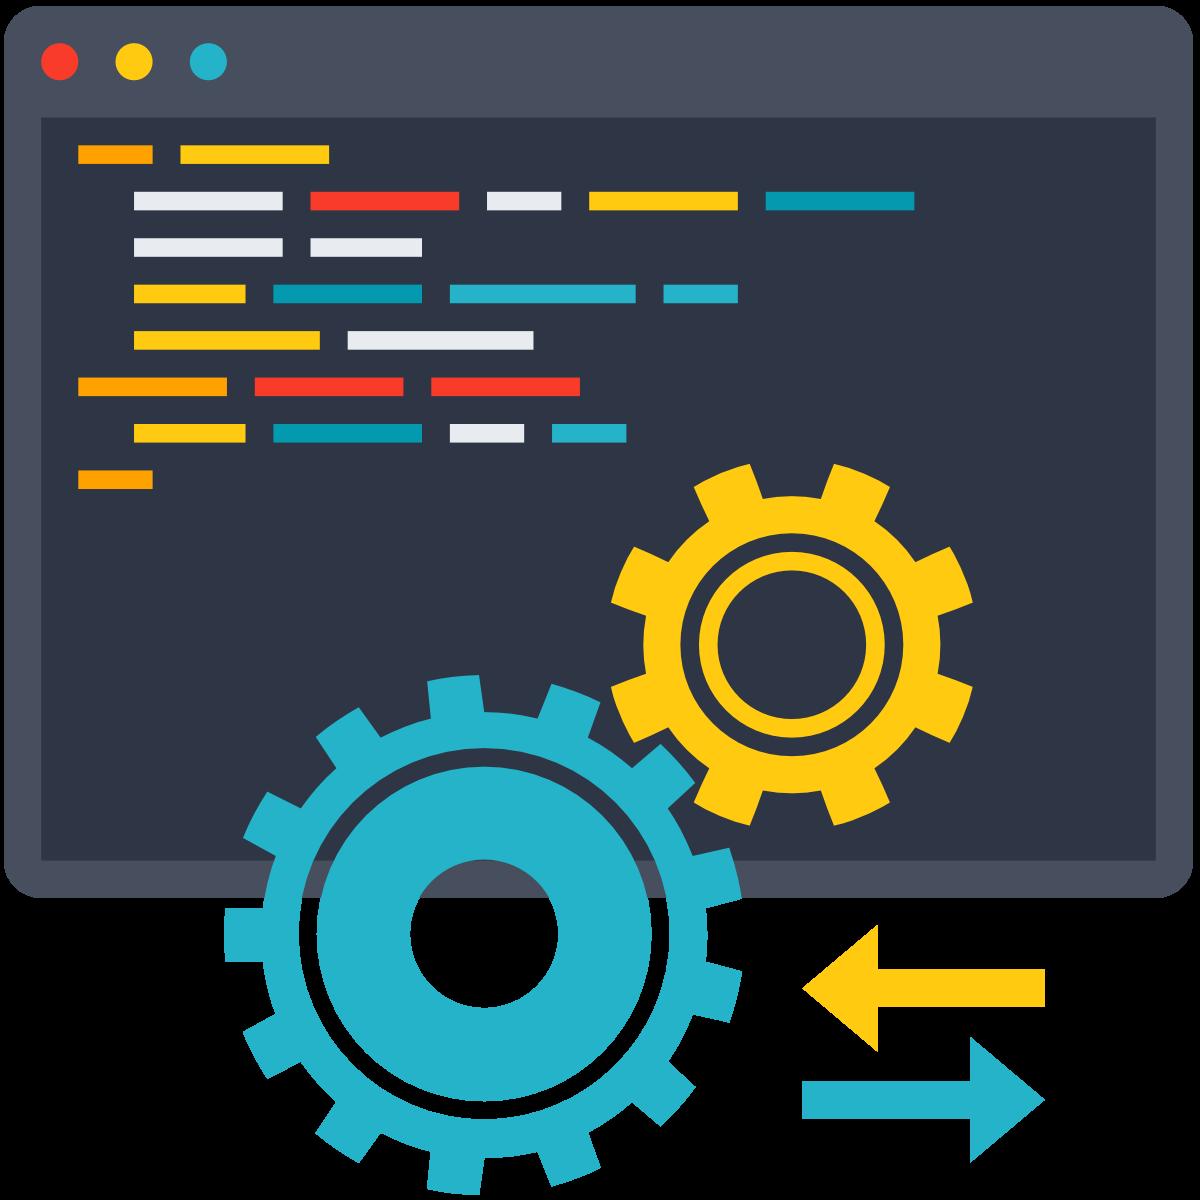 E-commerce engineering image